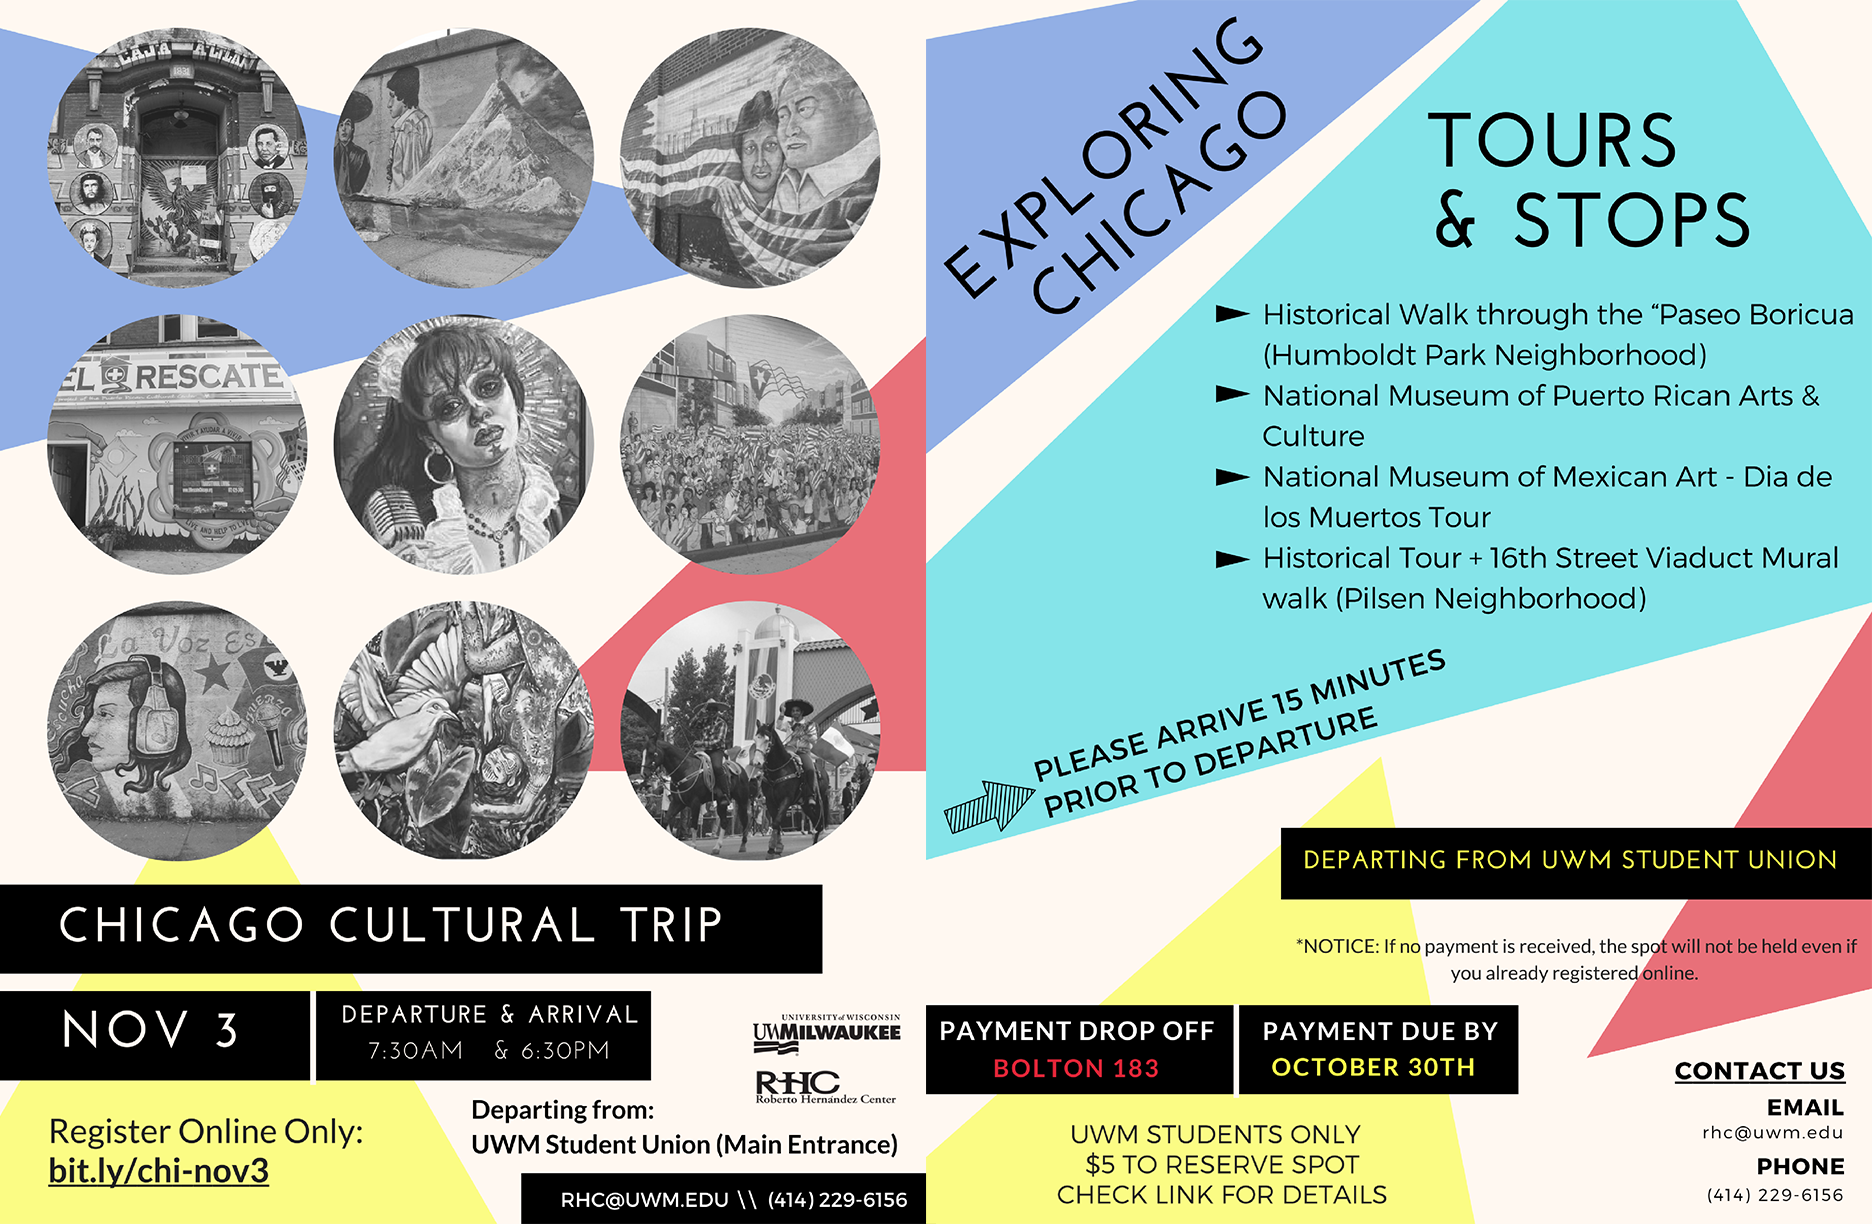 Chicago Cultural Trip 2017